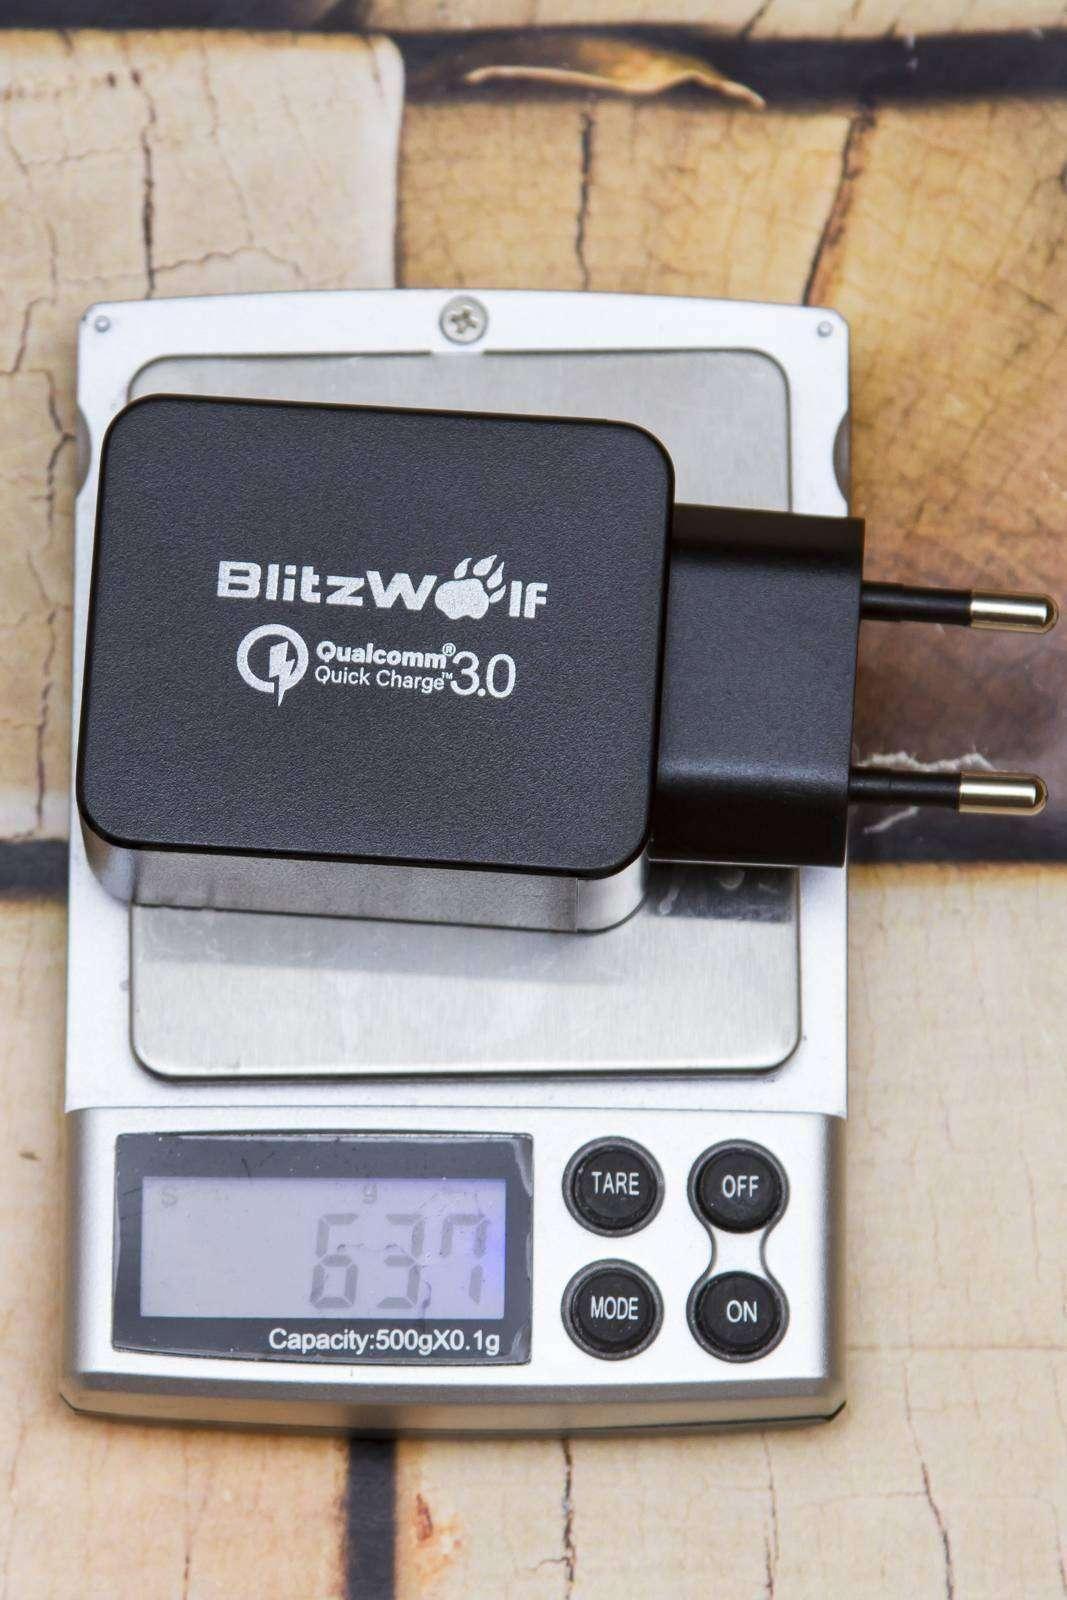 Banggood: Отличная зарядка с поддержкой Quick Charge 3.0 - BlitzWolf® BW-S5